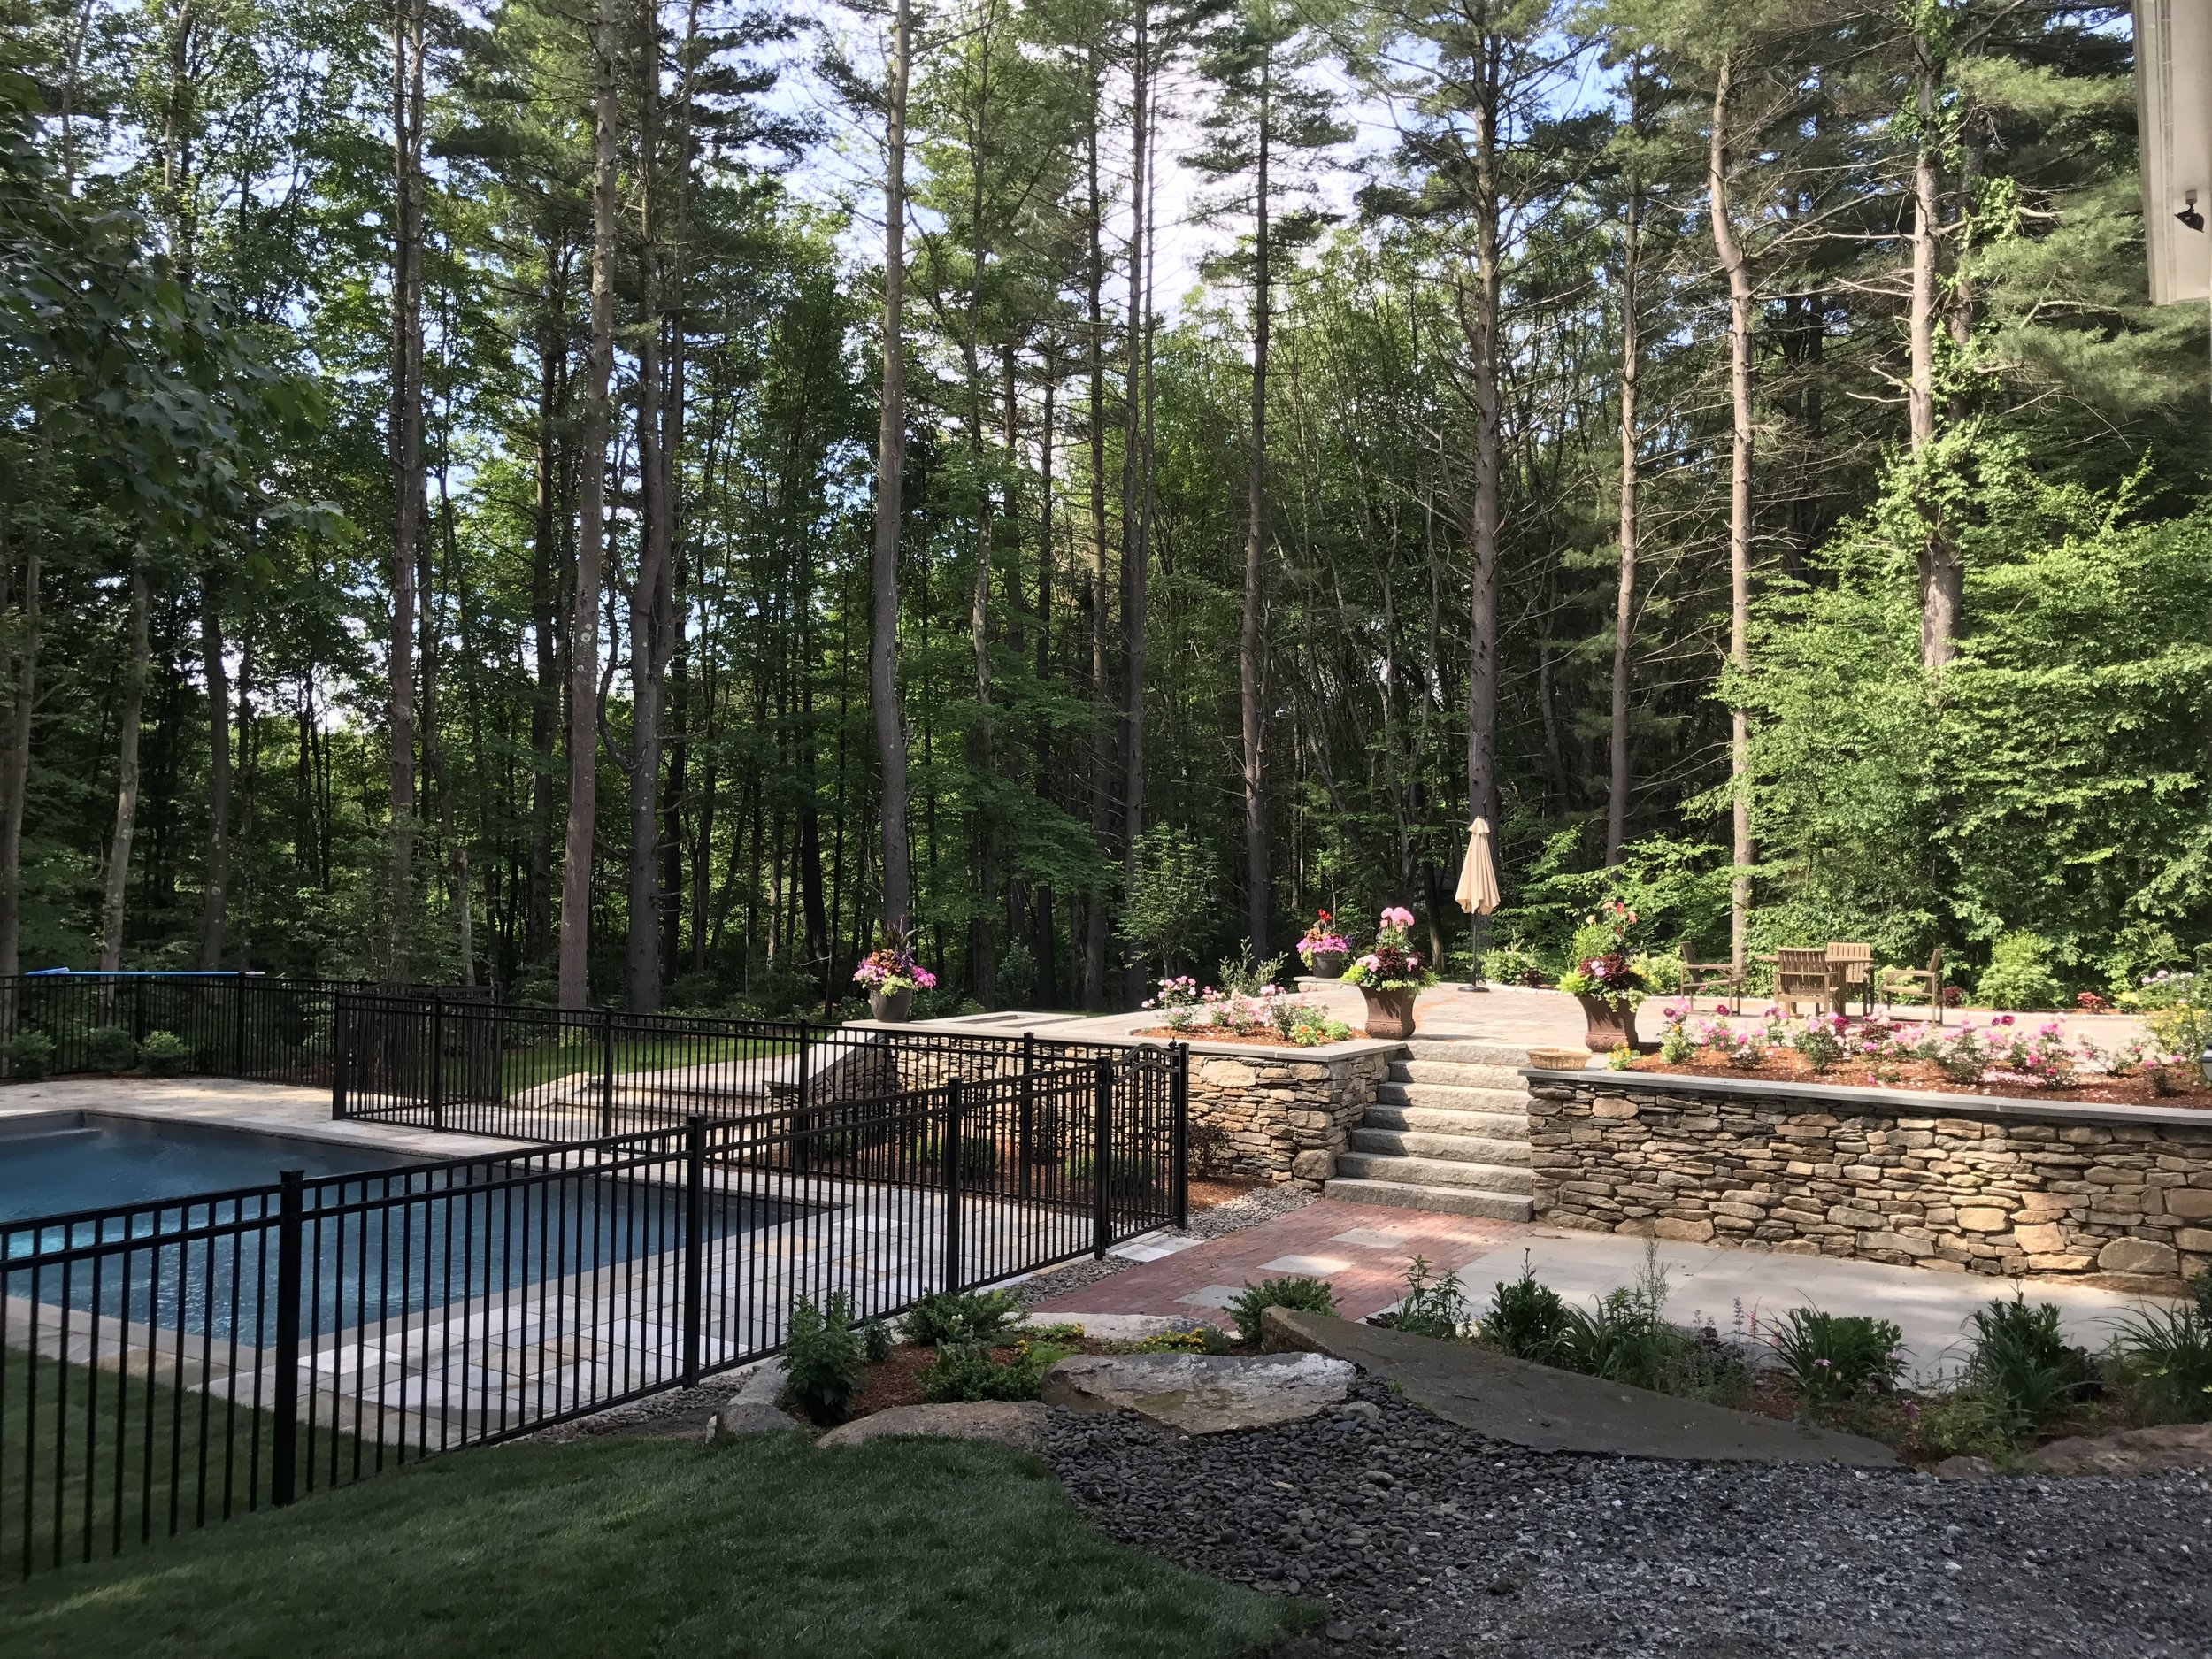 Pool, patio, lawn maintenance, lawn care, plantings